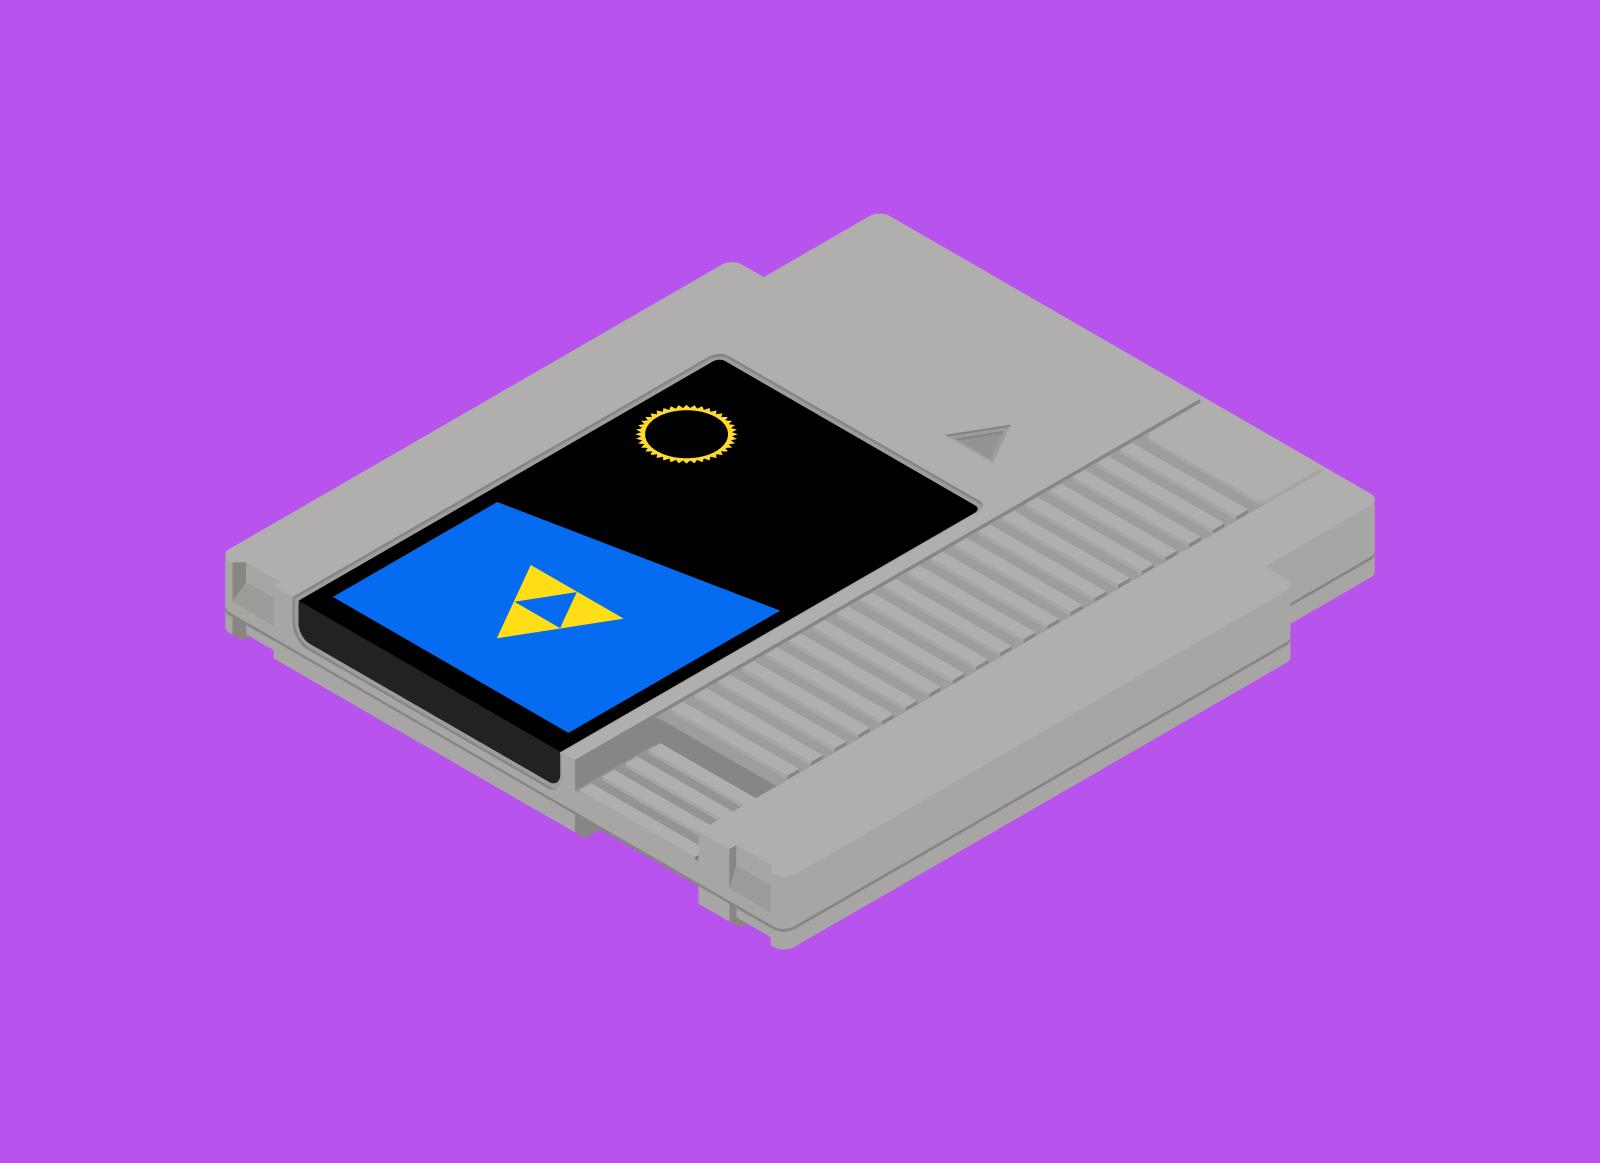 NES_Cartridge3.png